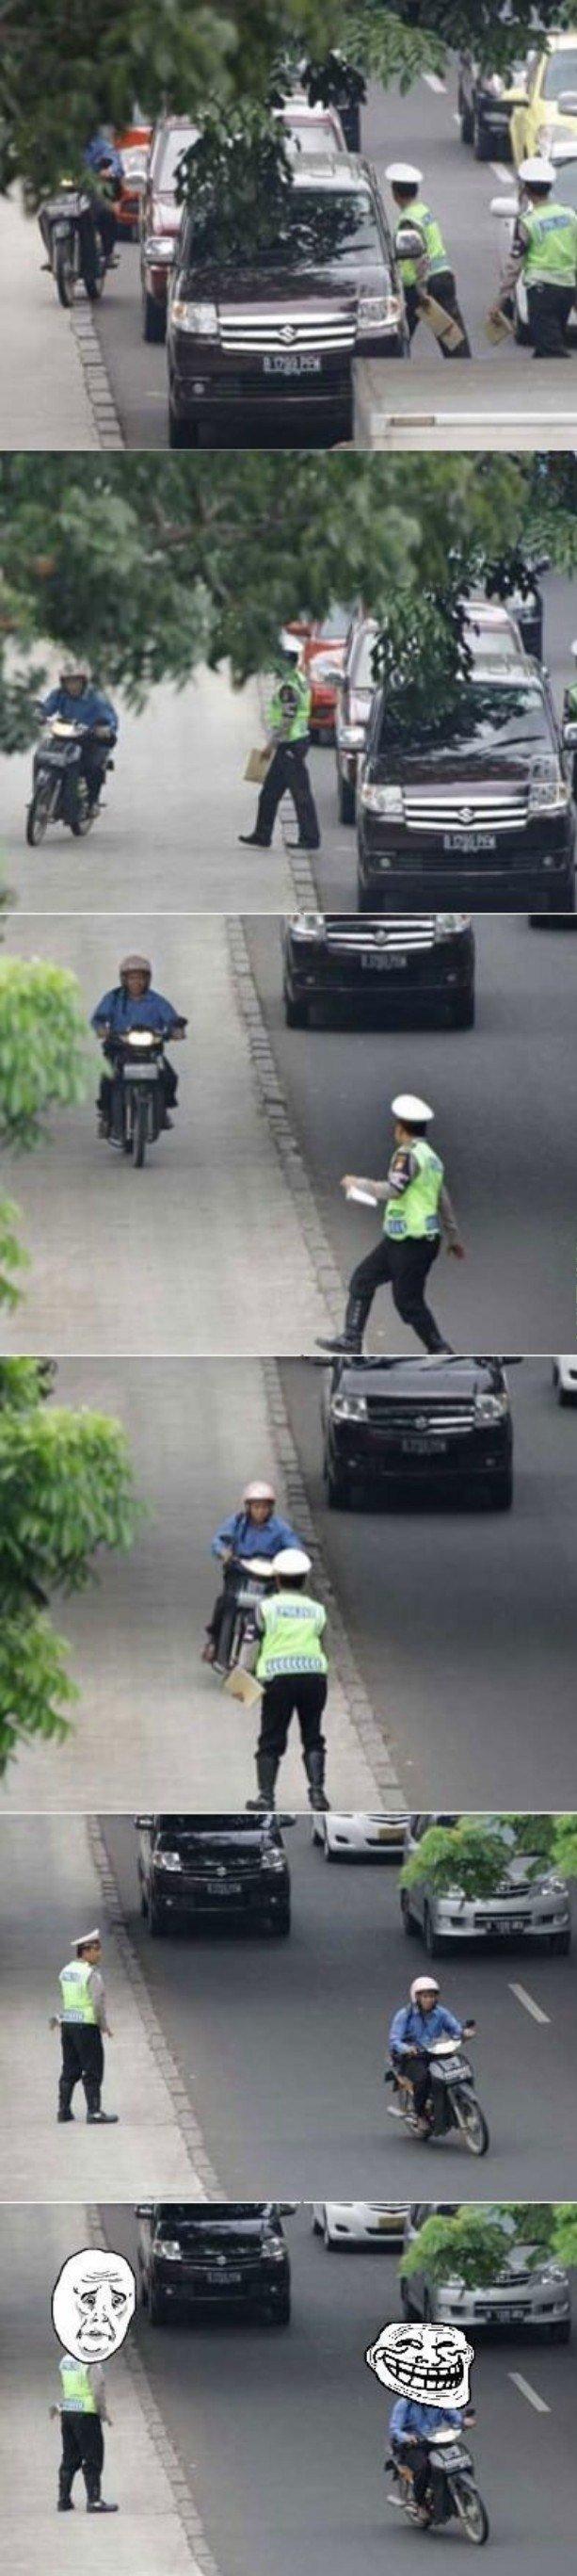 Policeman Fail. .. le me-mes fun funny pictures pics policeman fail fails